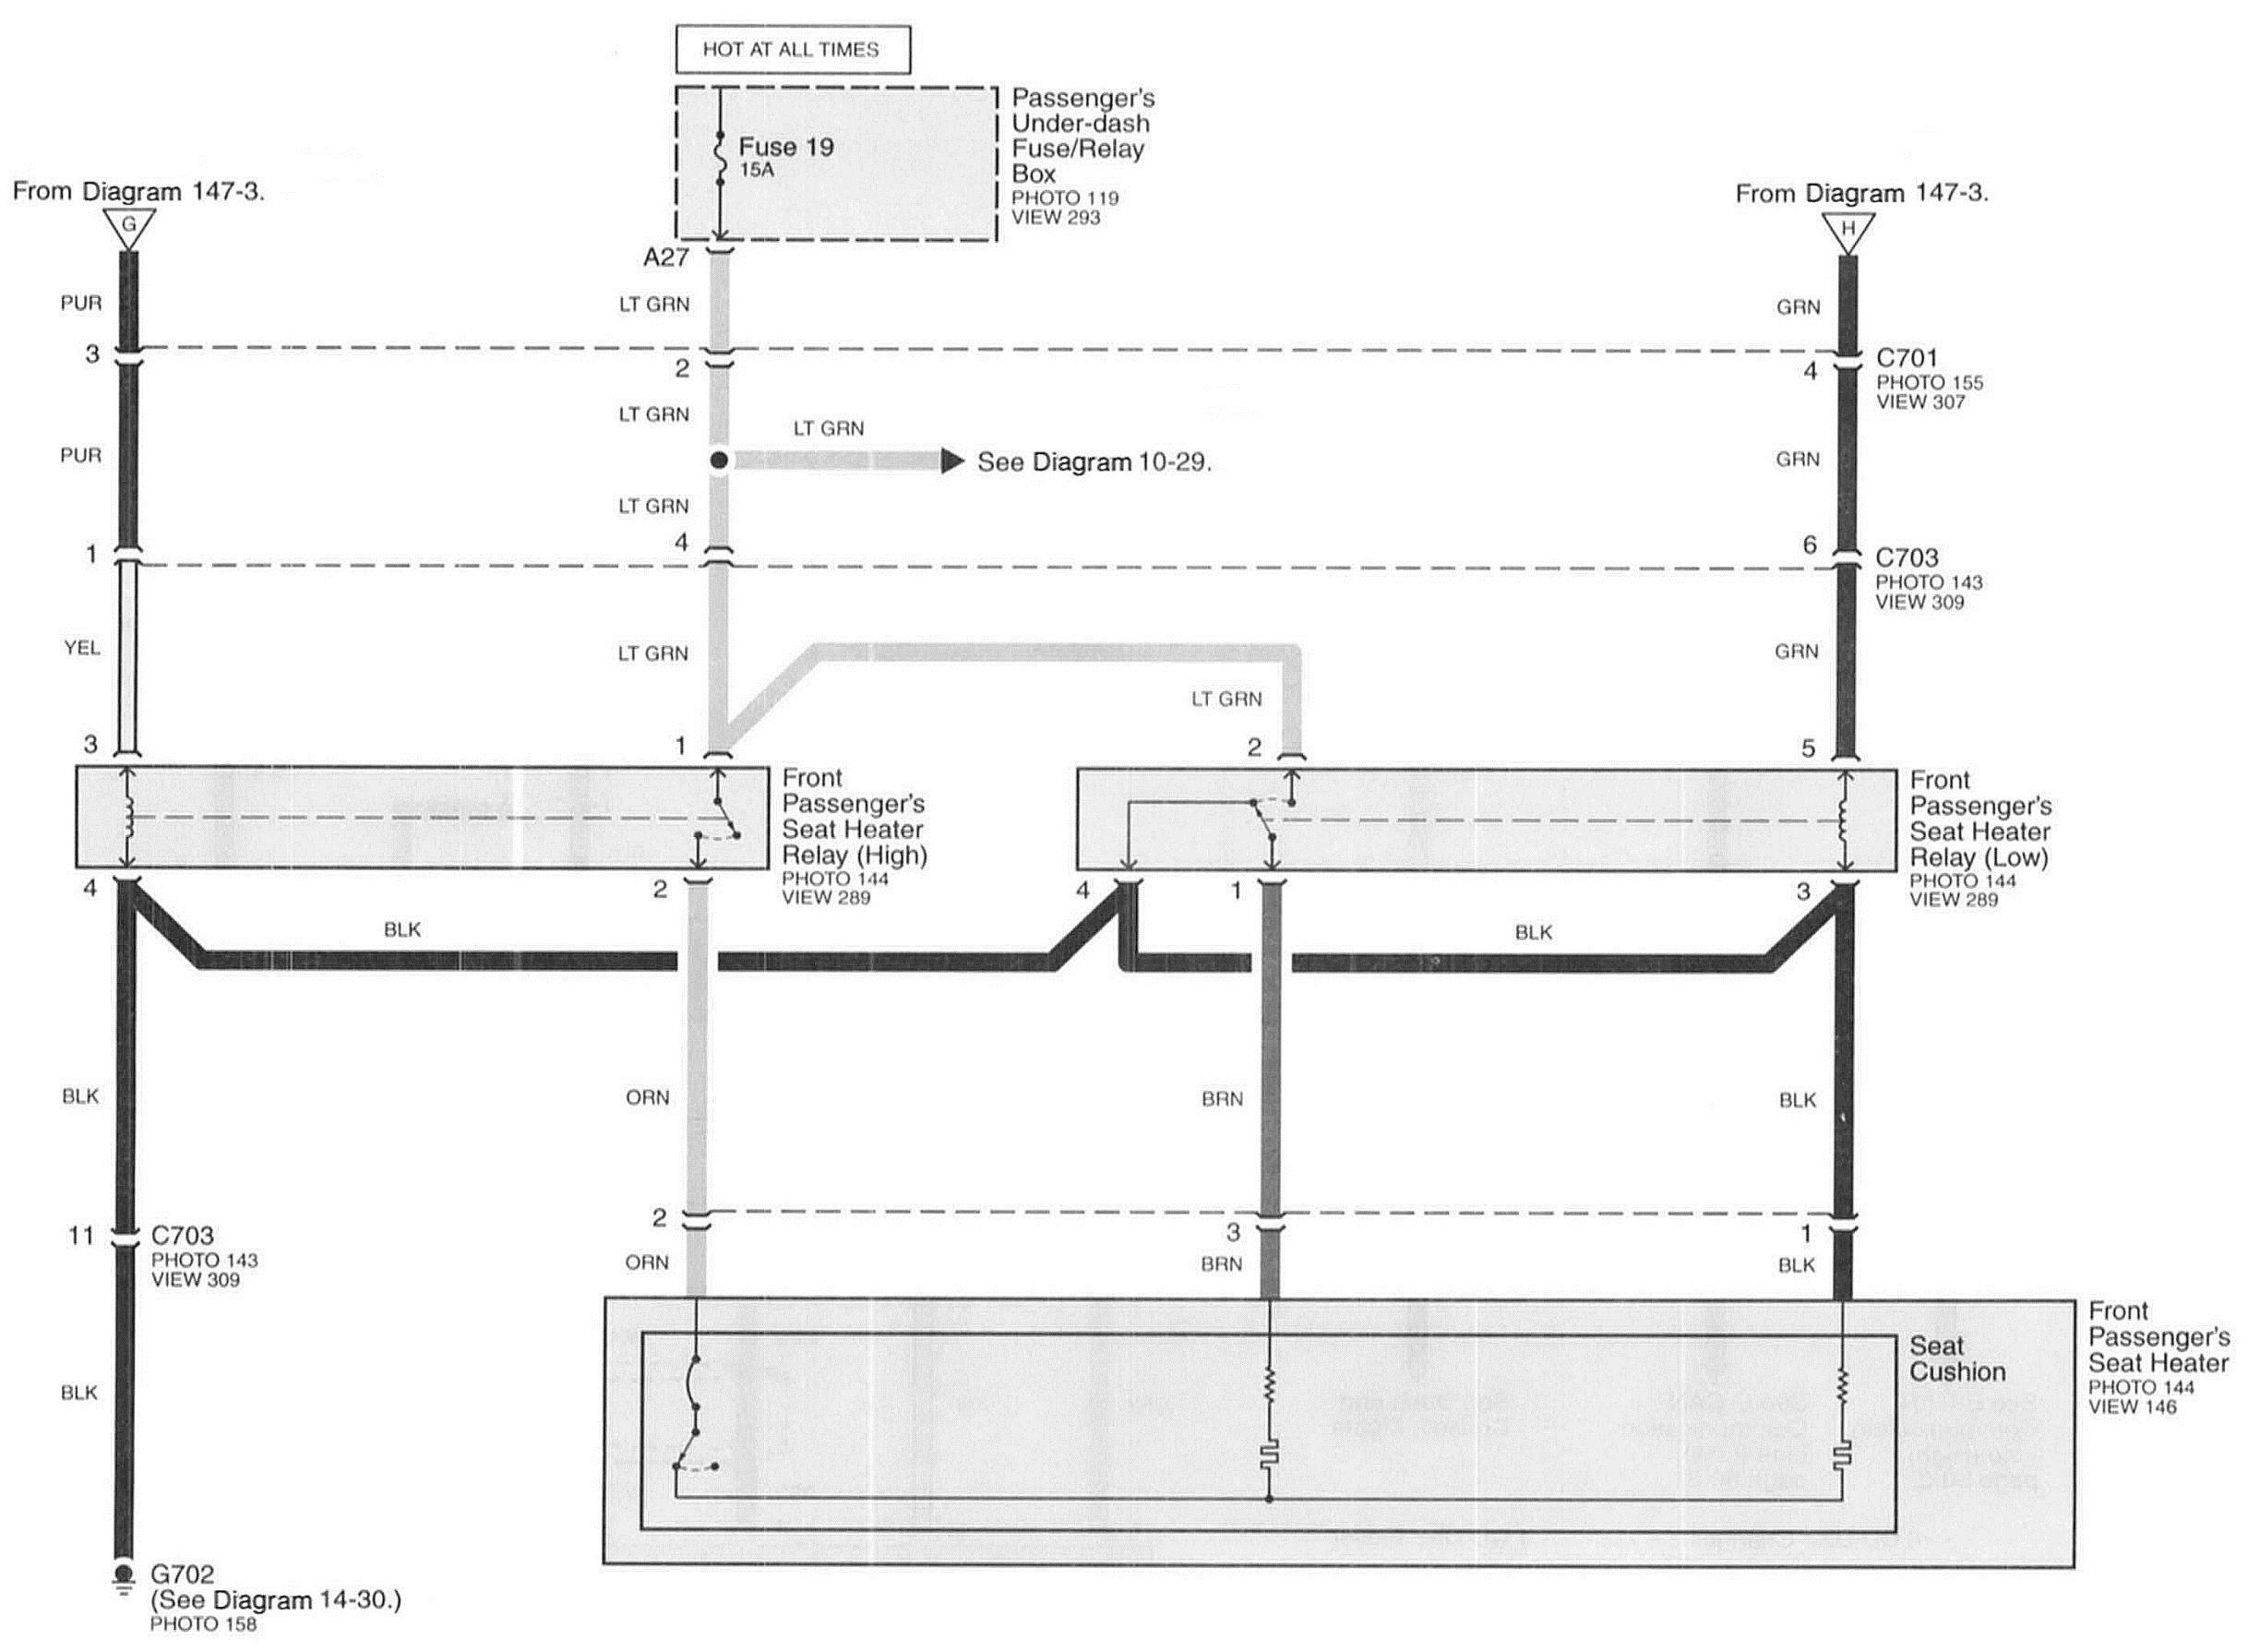 Roger Vivi Ersaks  2008 Accord Wiring Diagram